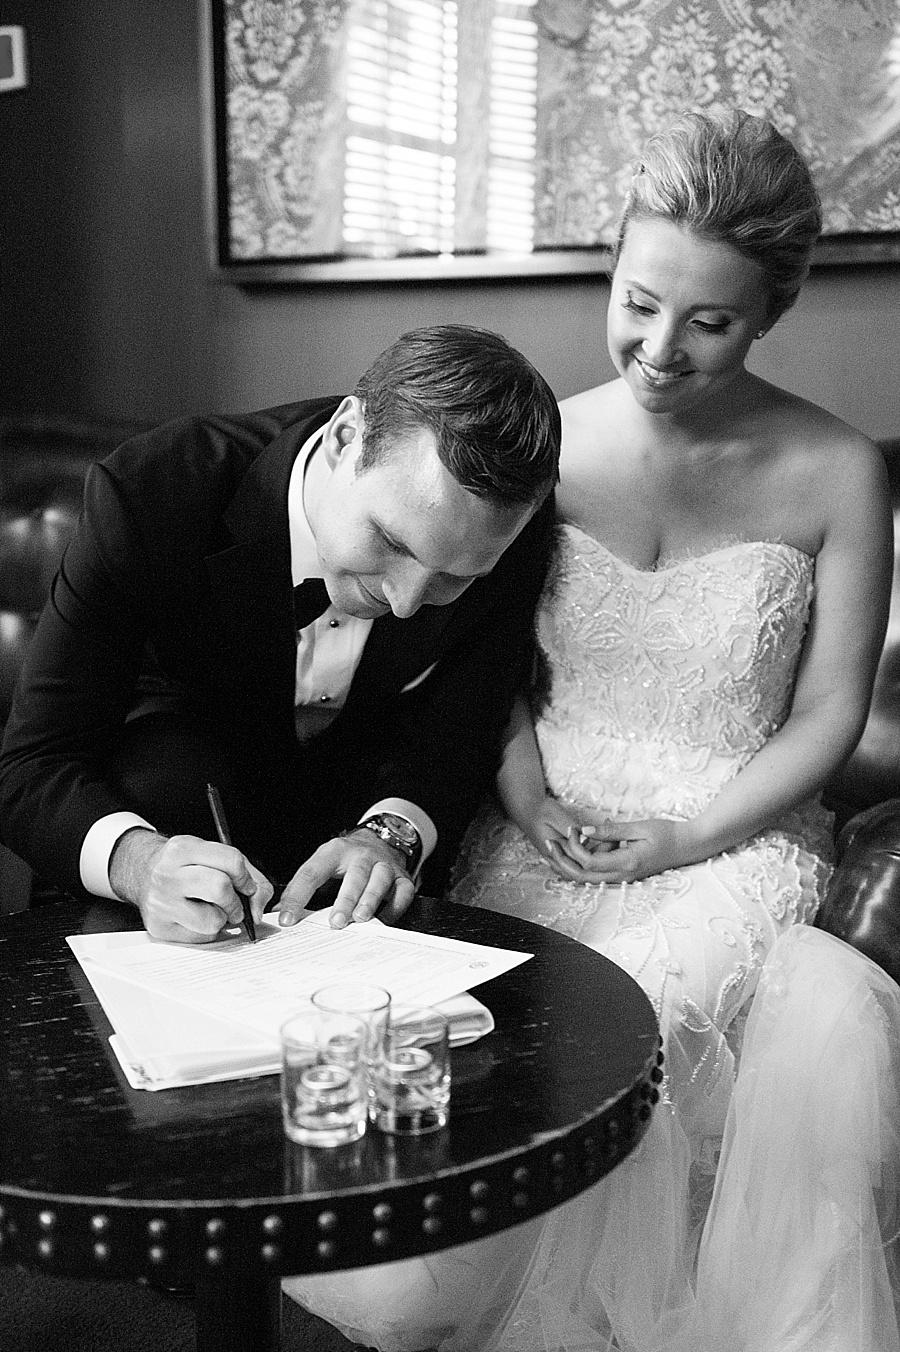 Gramercy_Park_Hotel_Wedding_023.jpg